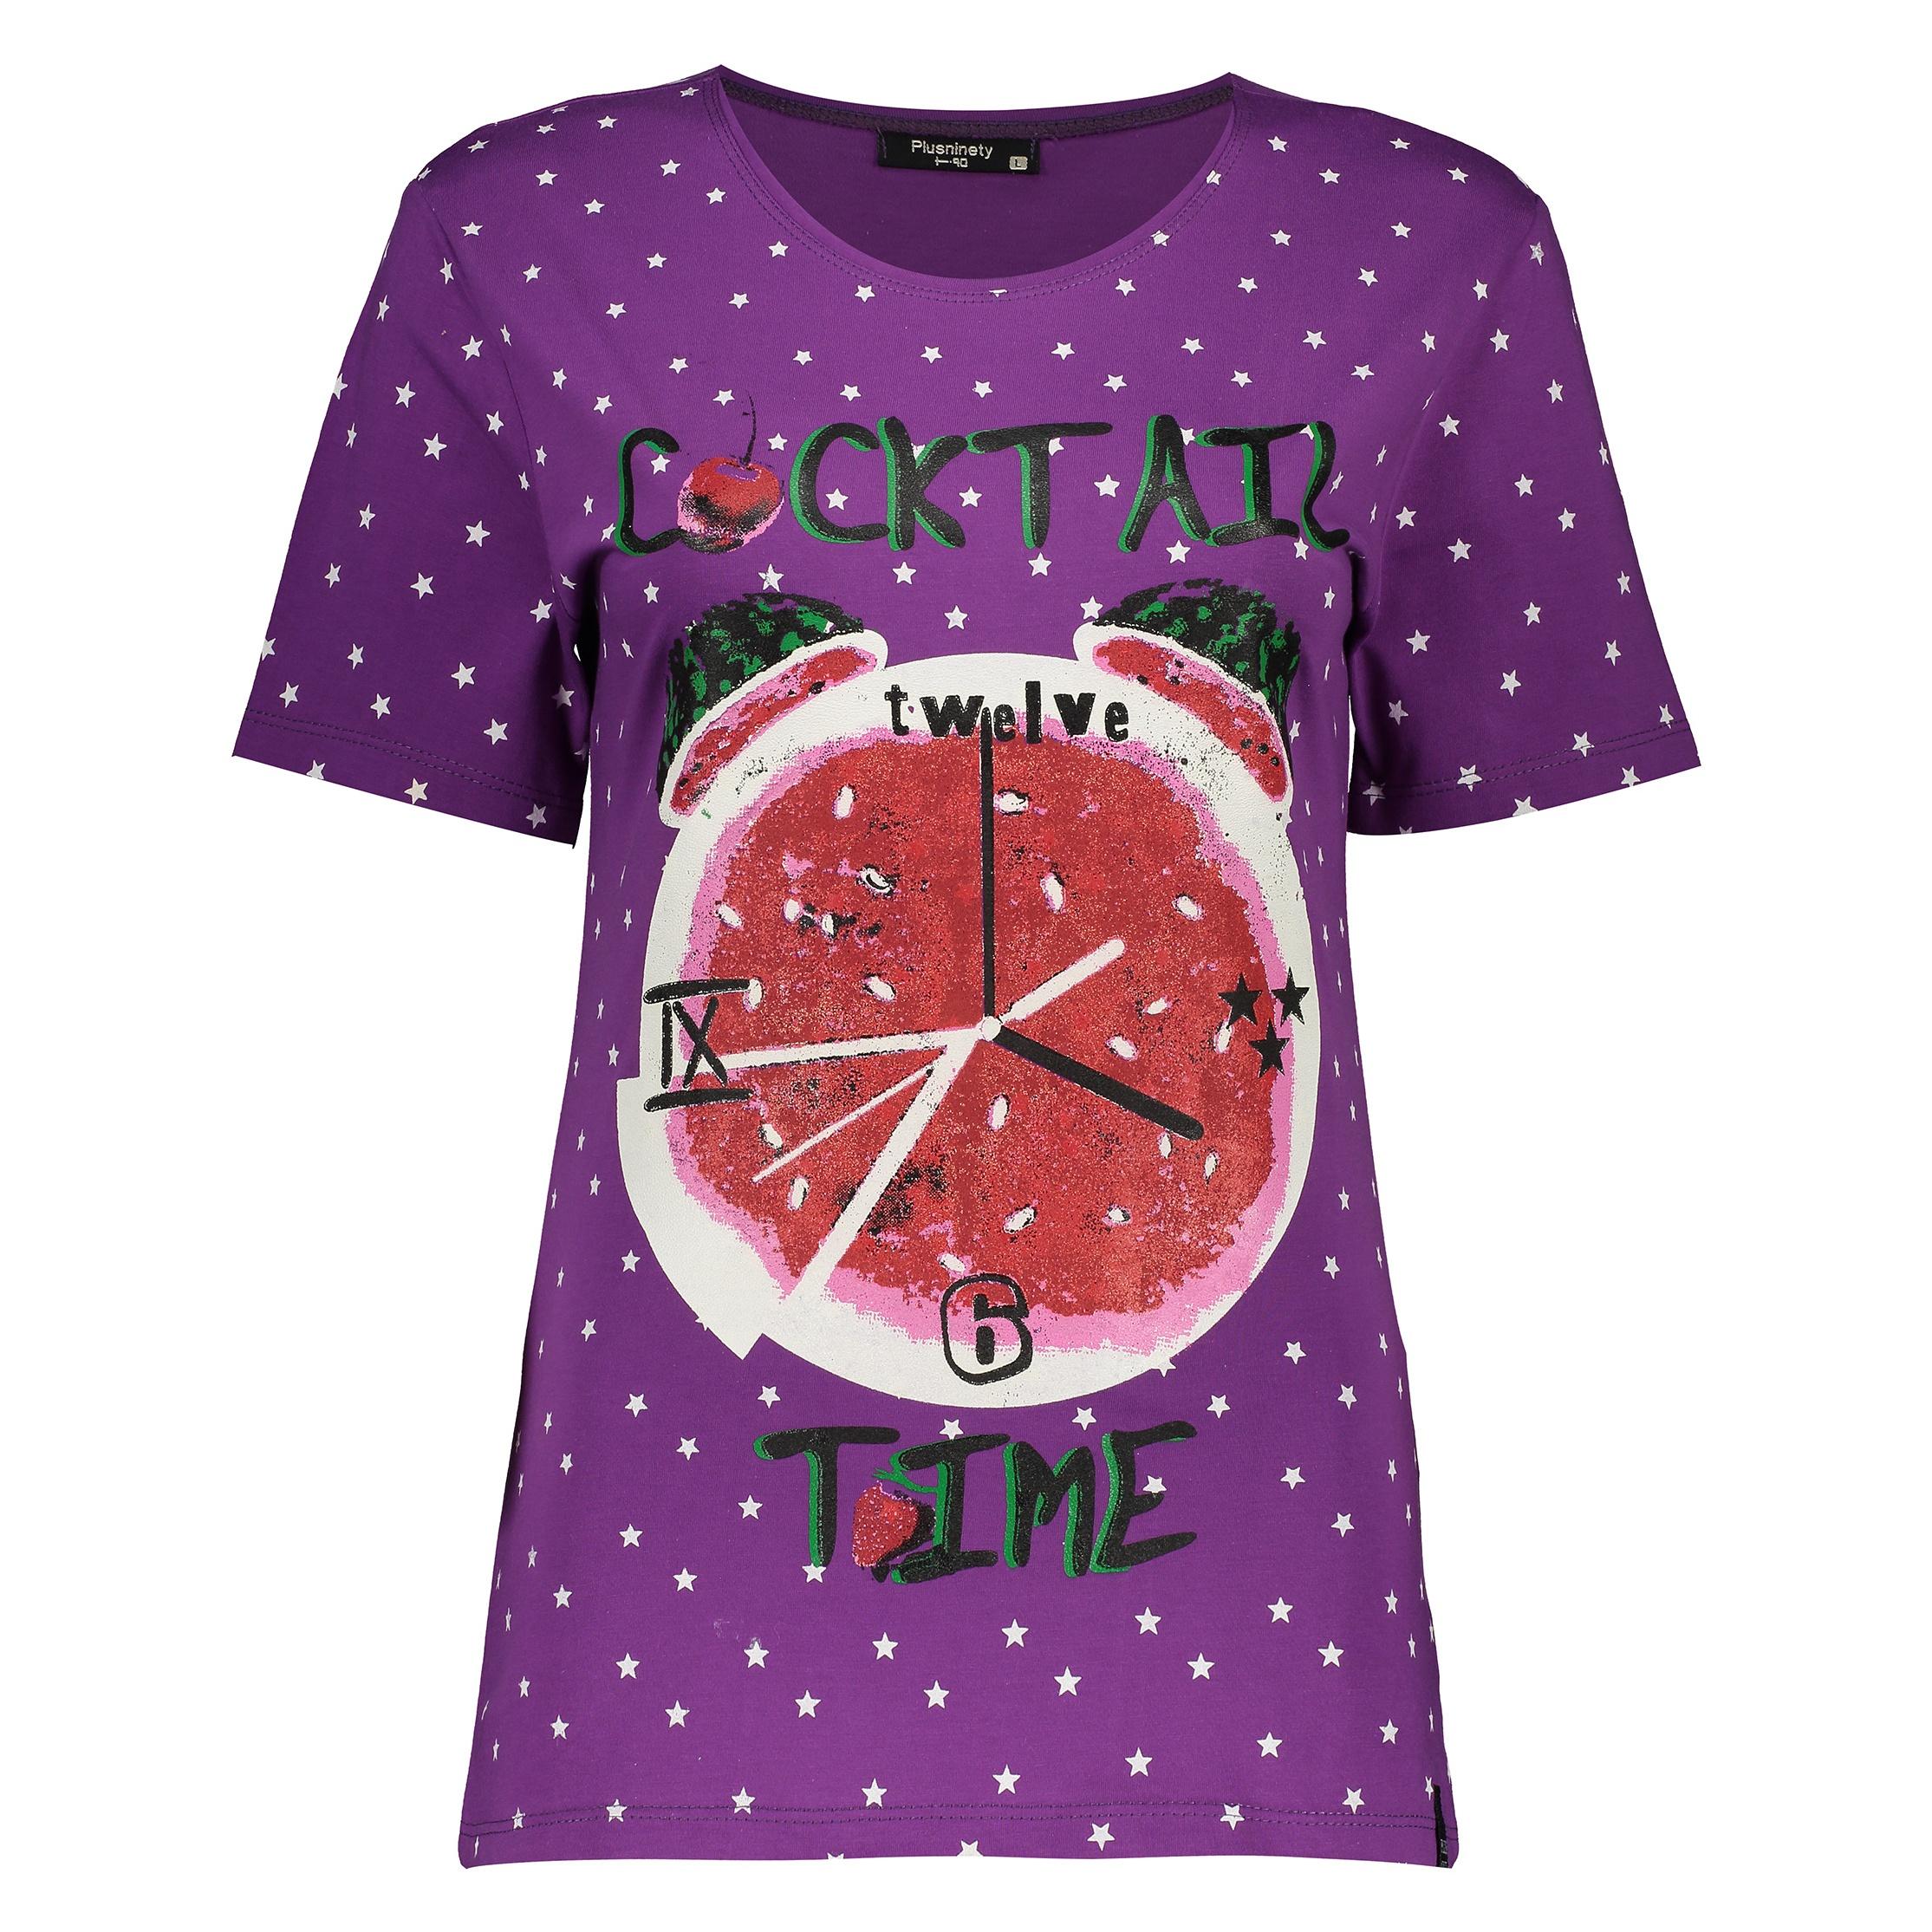 تی شرت زنانه پلاس ناینتی کد 19